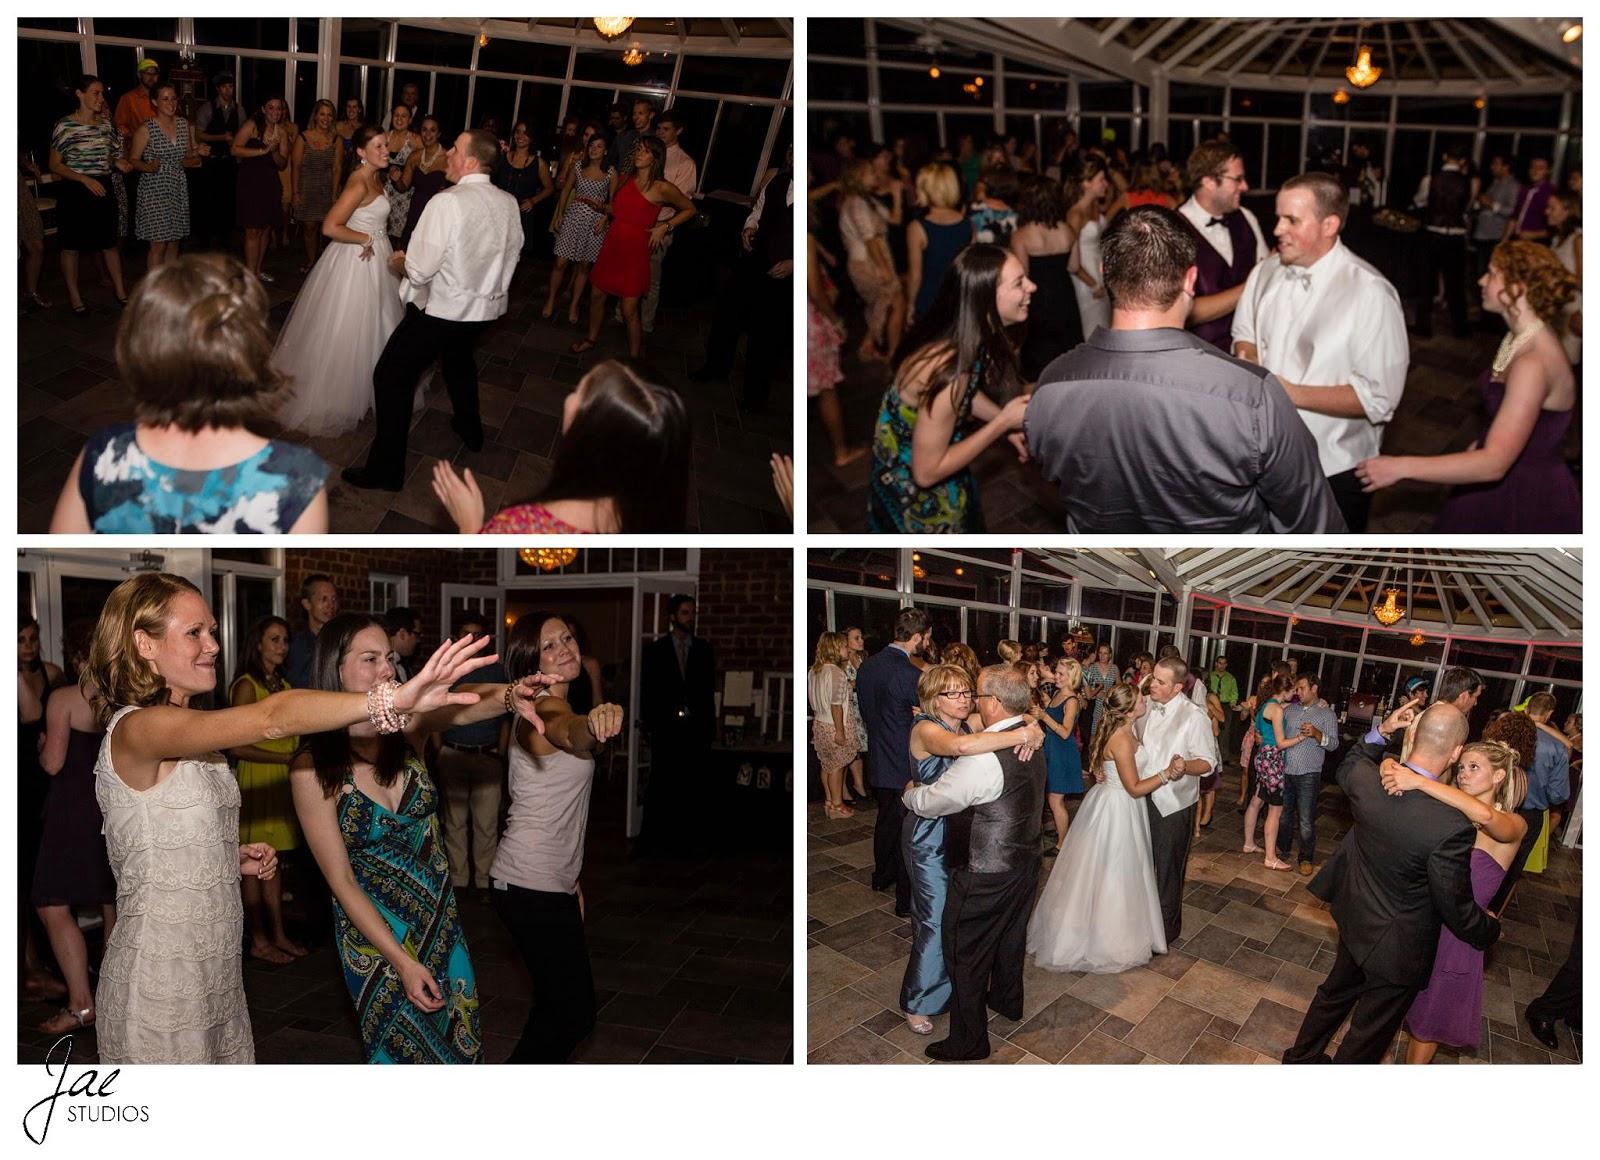 Jonathan and Julie, Bird cage, West Manor Estate, Wedding, Lynchburg, Virginia, Jae Studios, dancing, reception, wedding dress, groom, bride